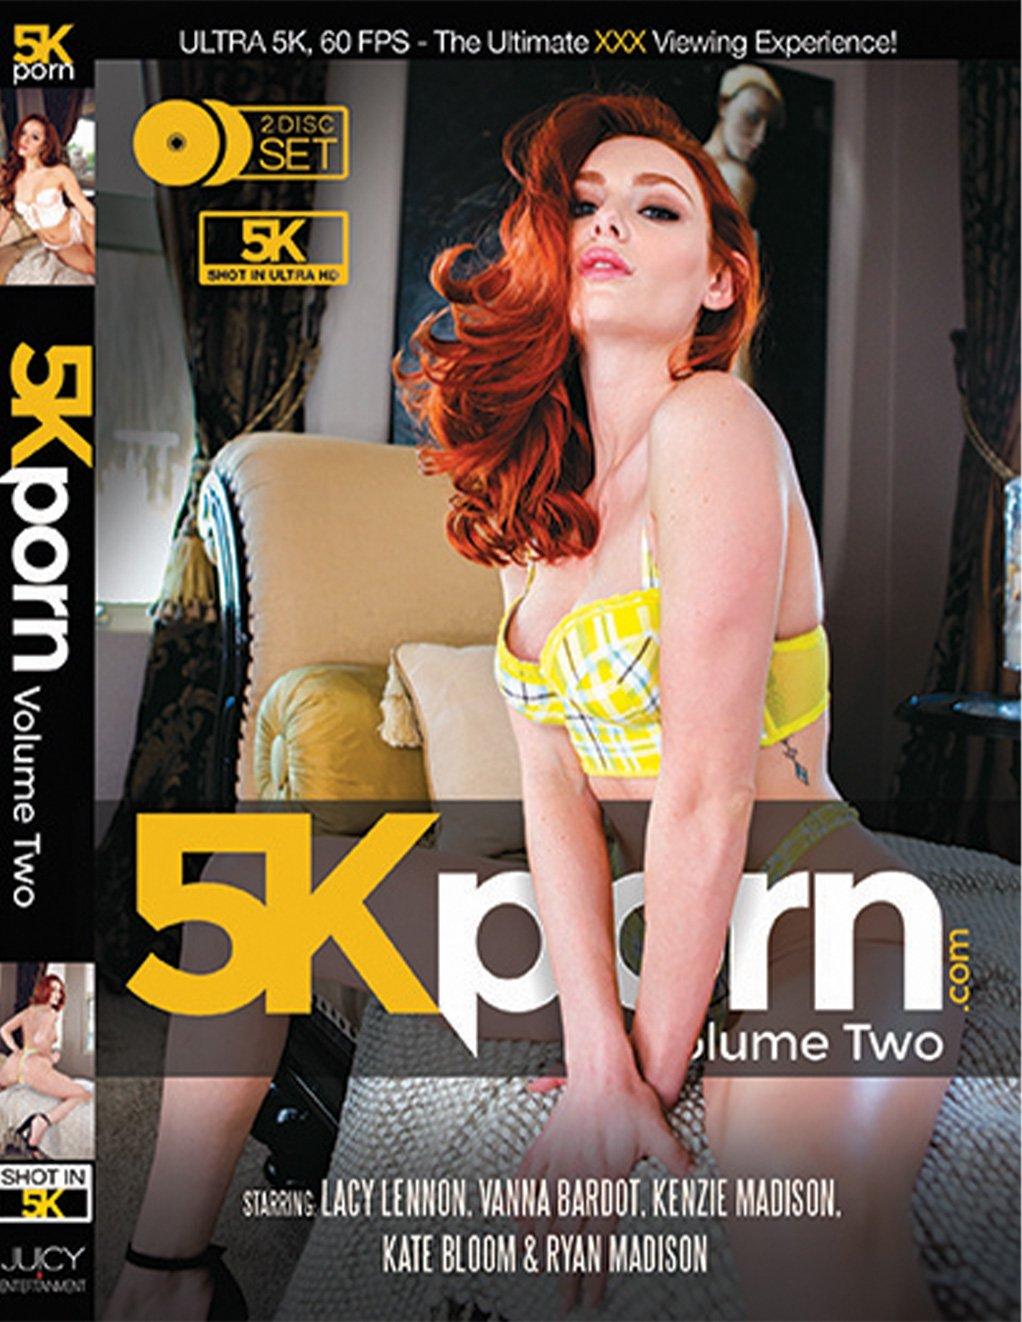 5K Porn Volume Two